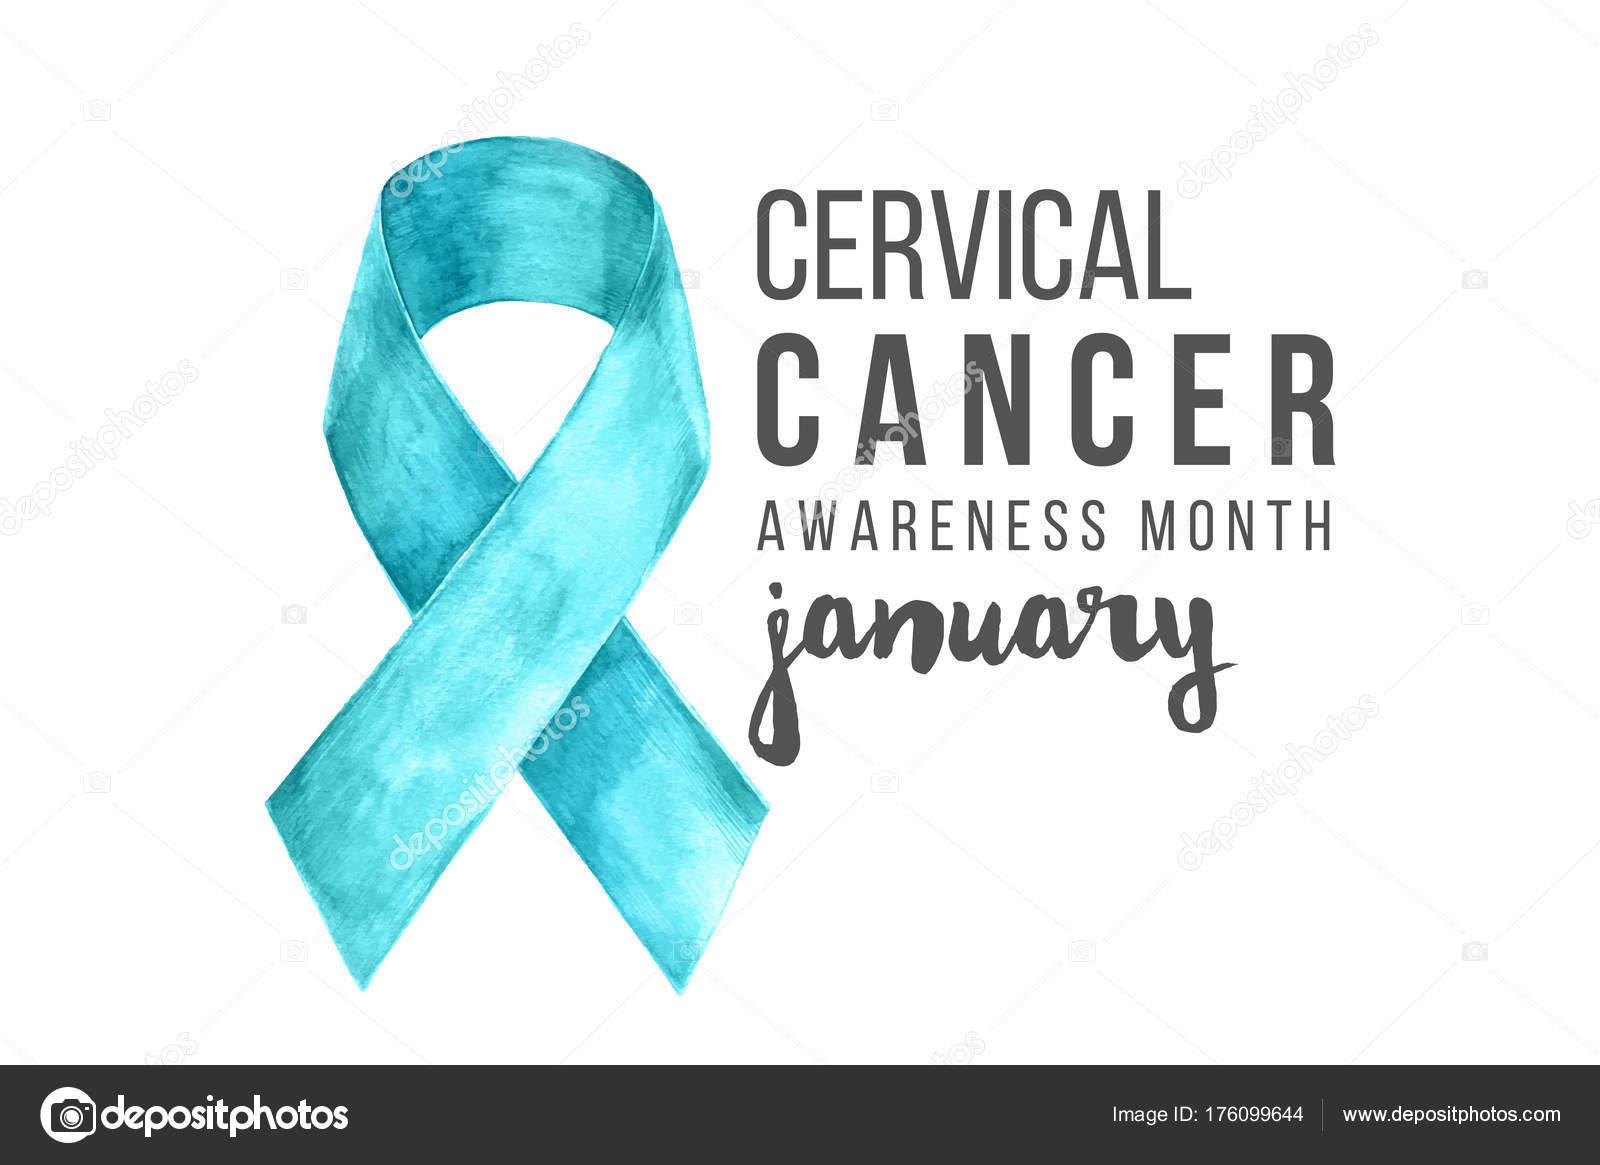 Cervical Cancer Awareness Month Banner Stock Vector C Mart M 176099644